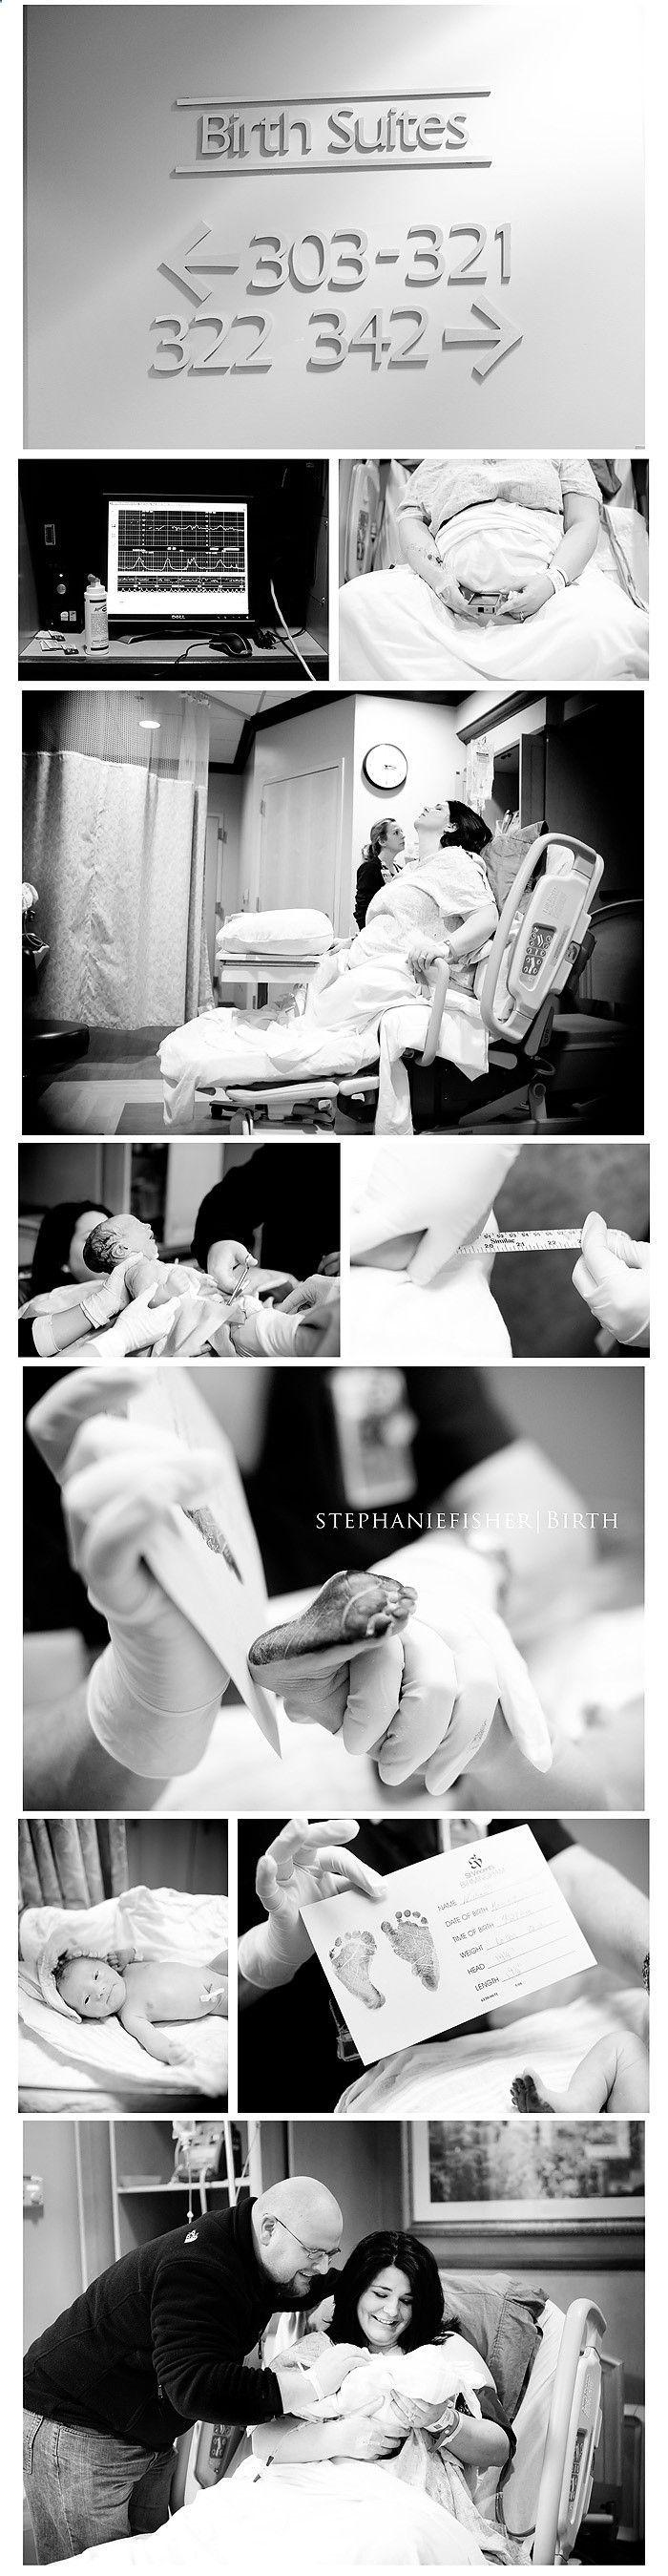 Labor: hospital photography.